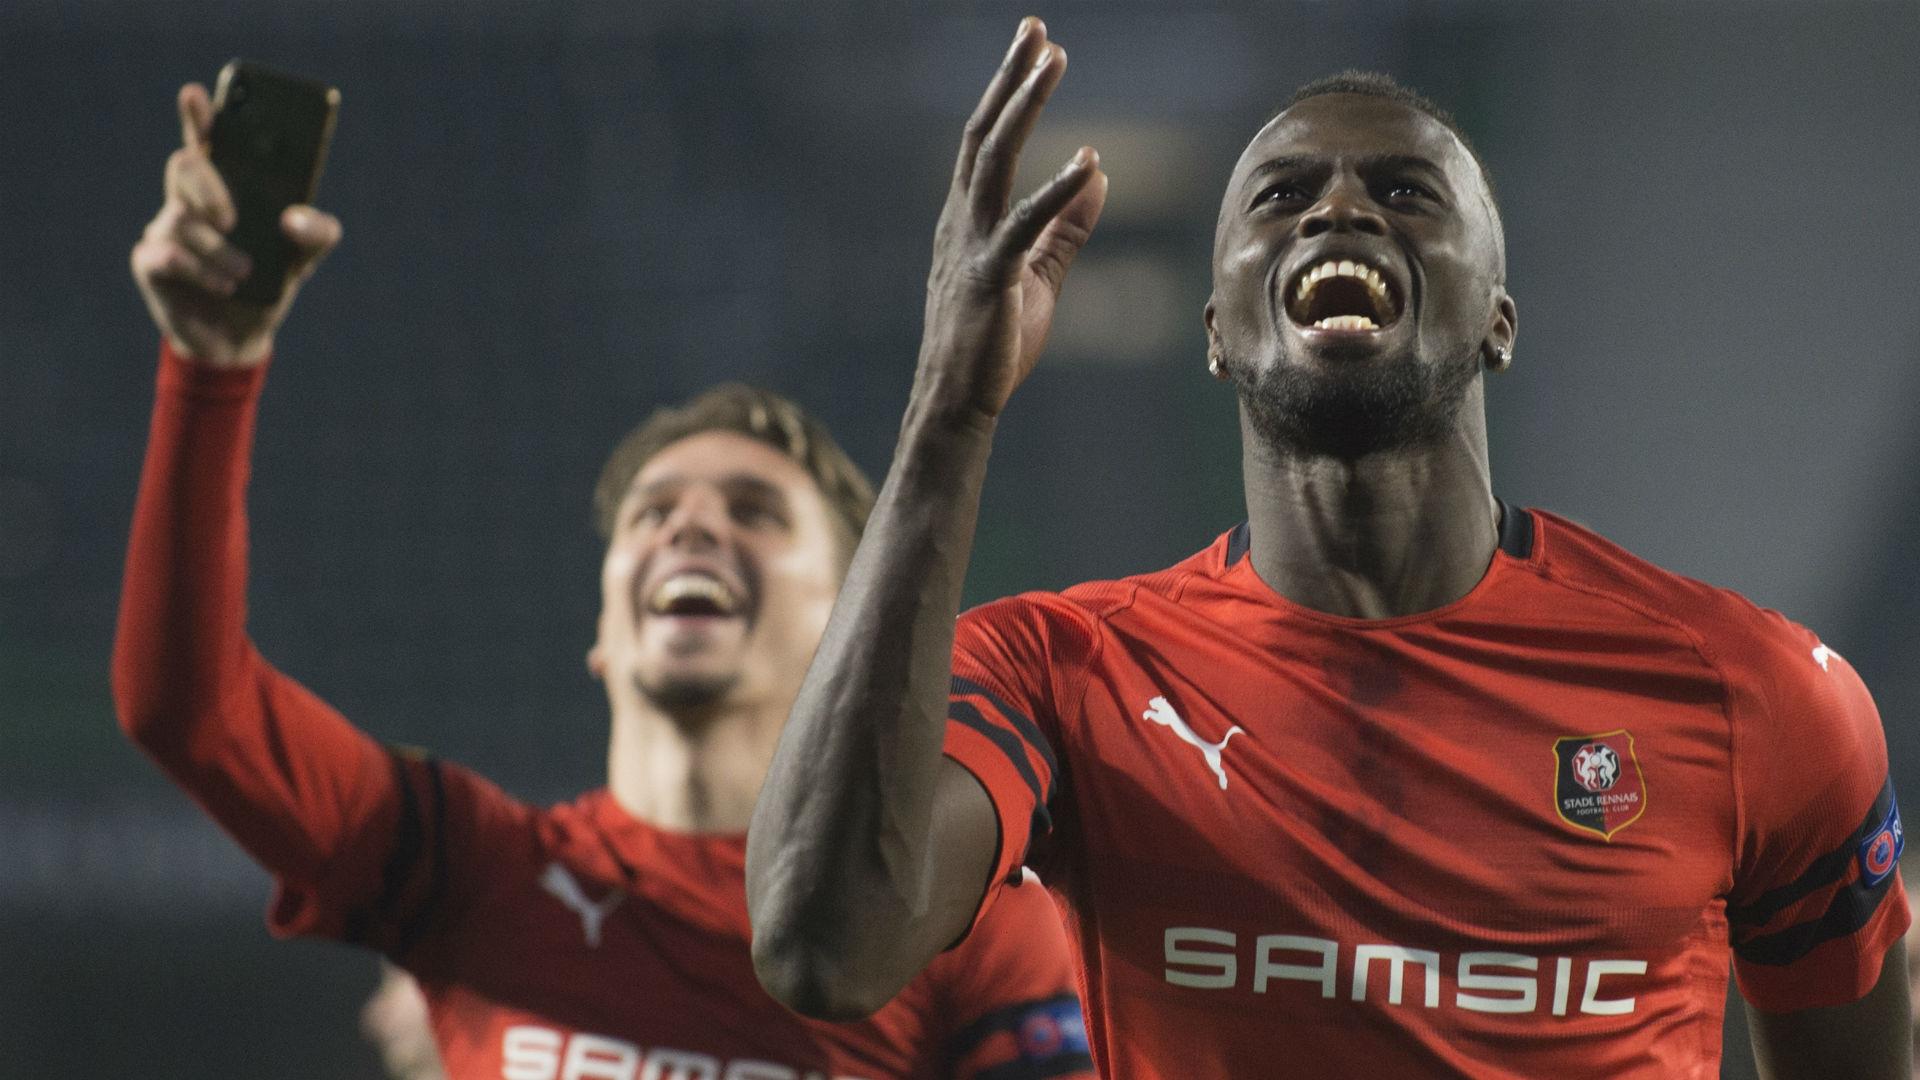 Rennes, Maurice veut retenir Camavinga coûte que coûte